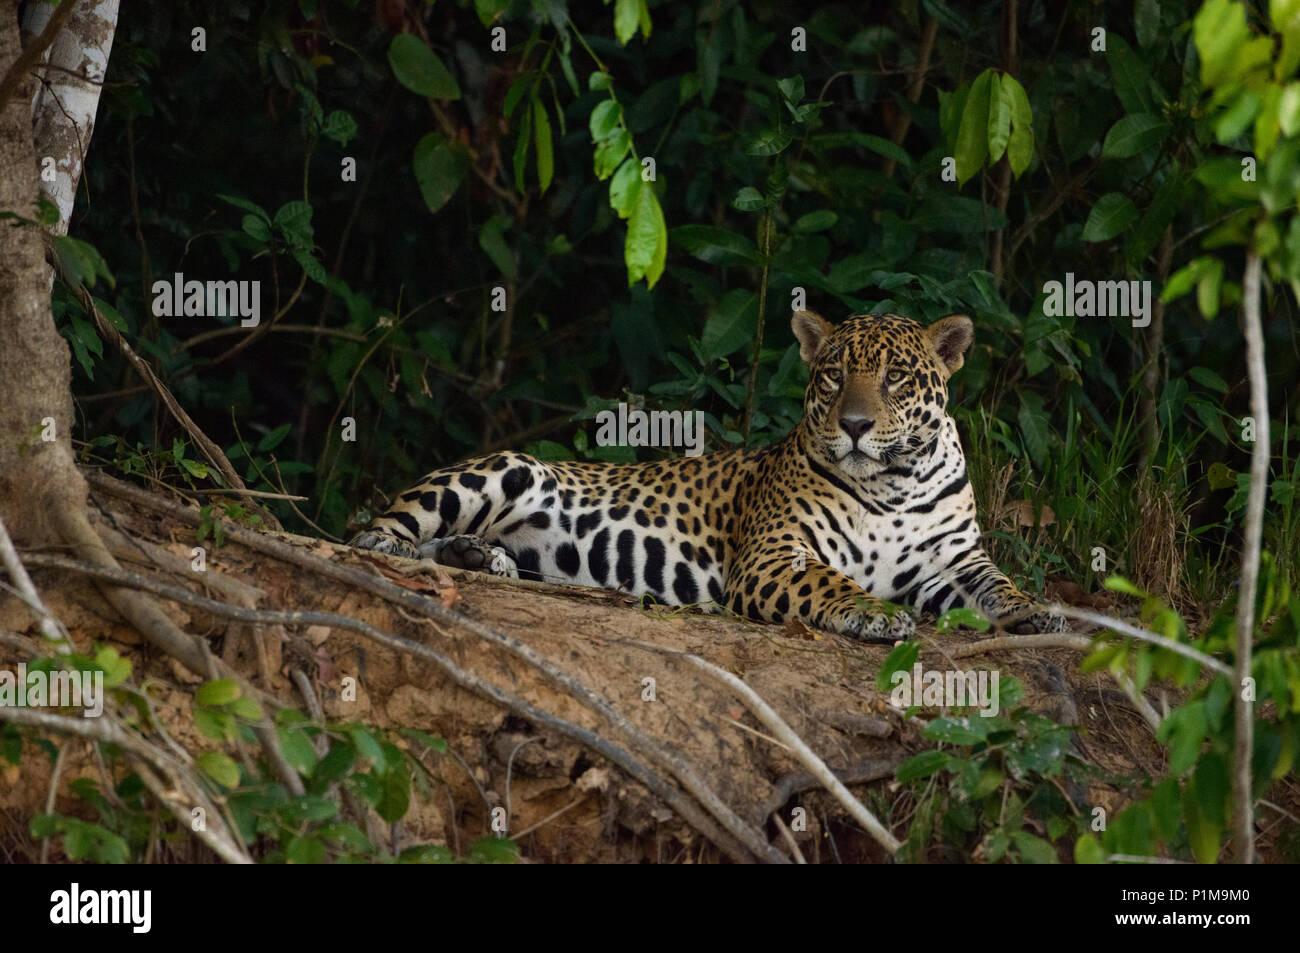 A wild Jaguar from the Pantanal of Brazil - Stock Image